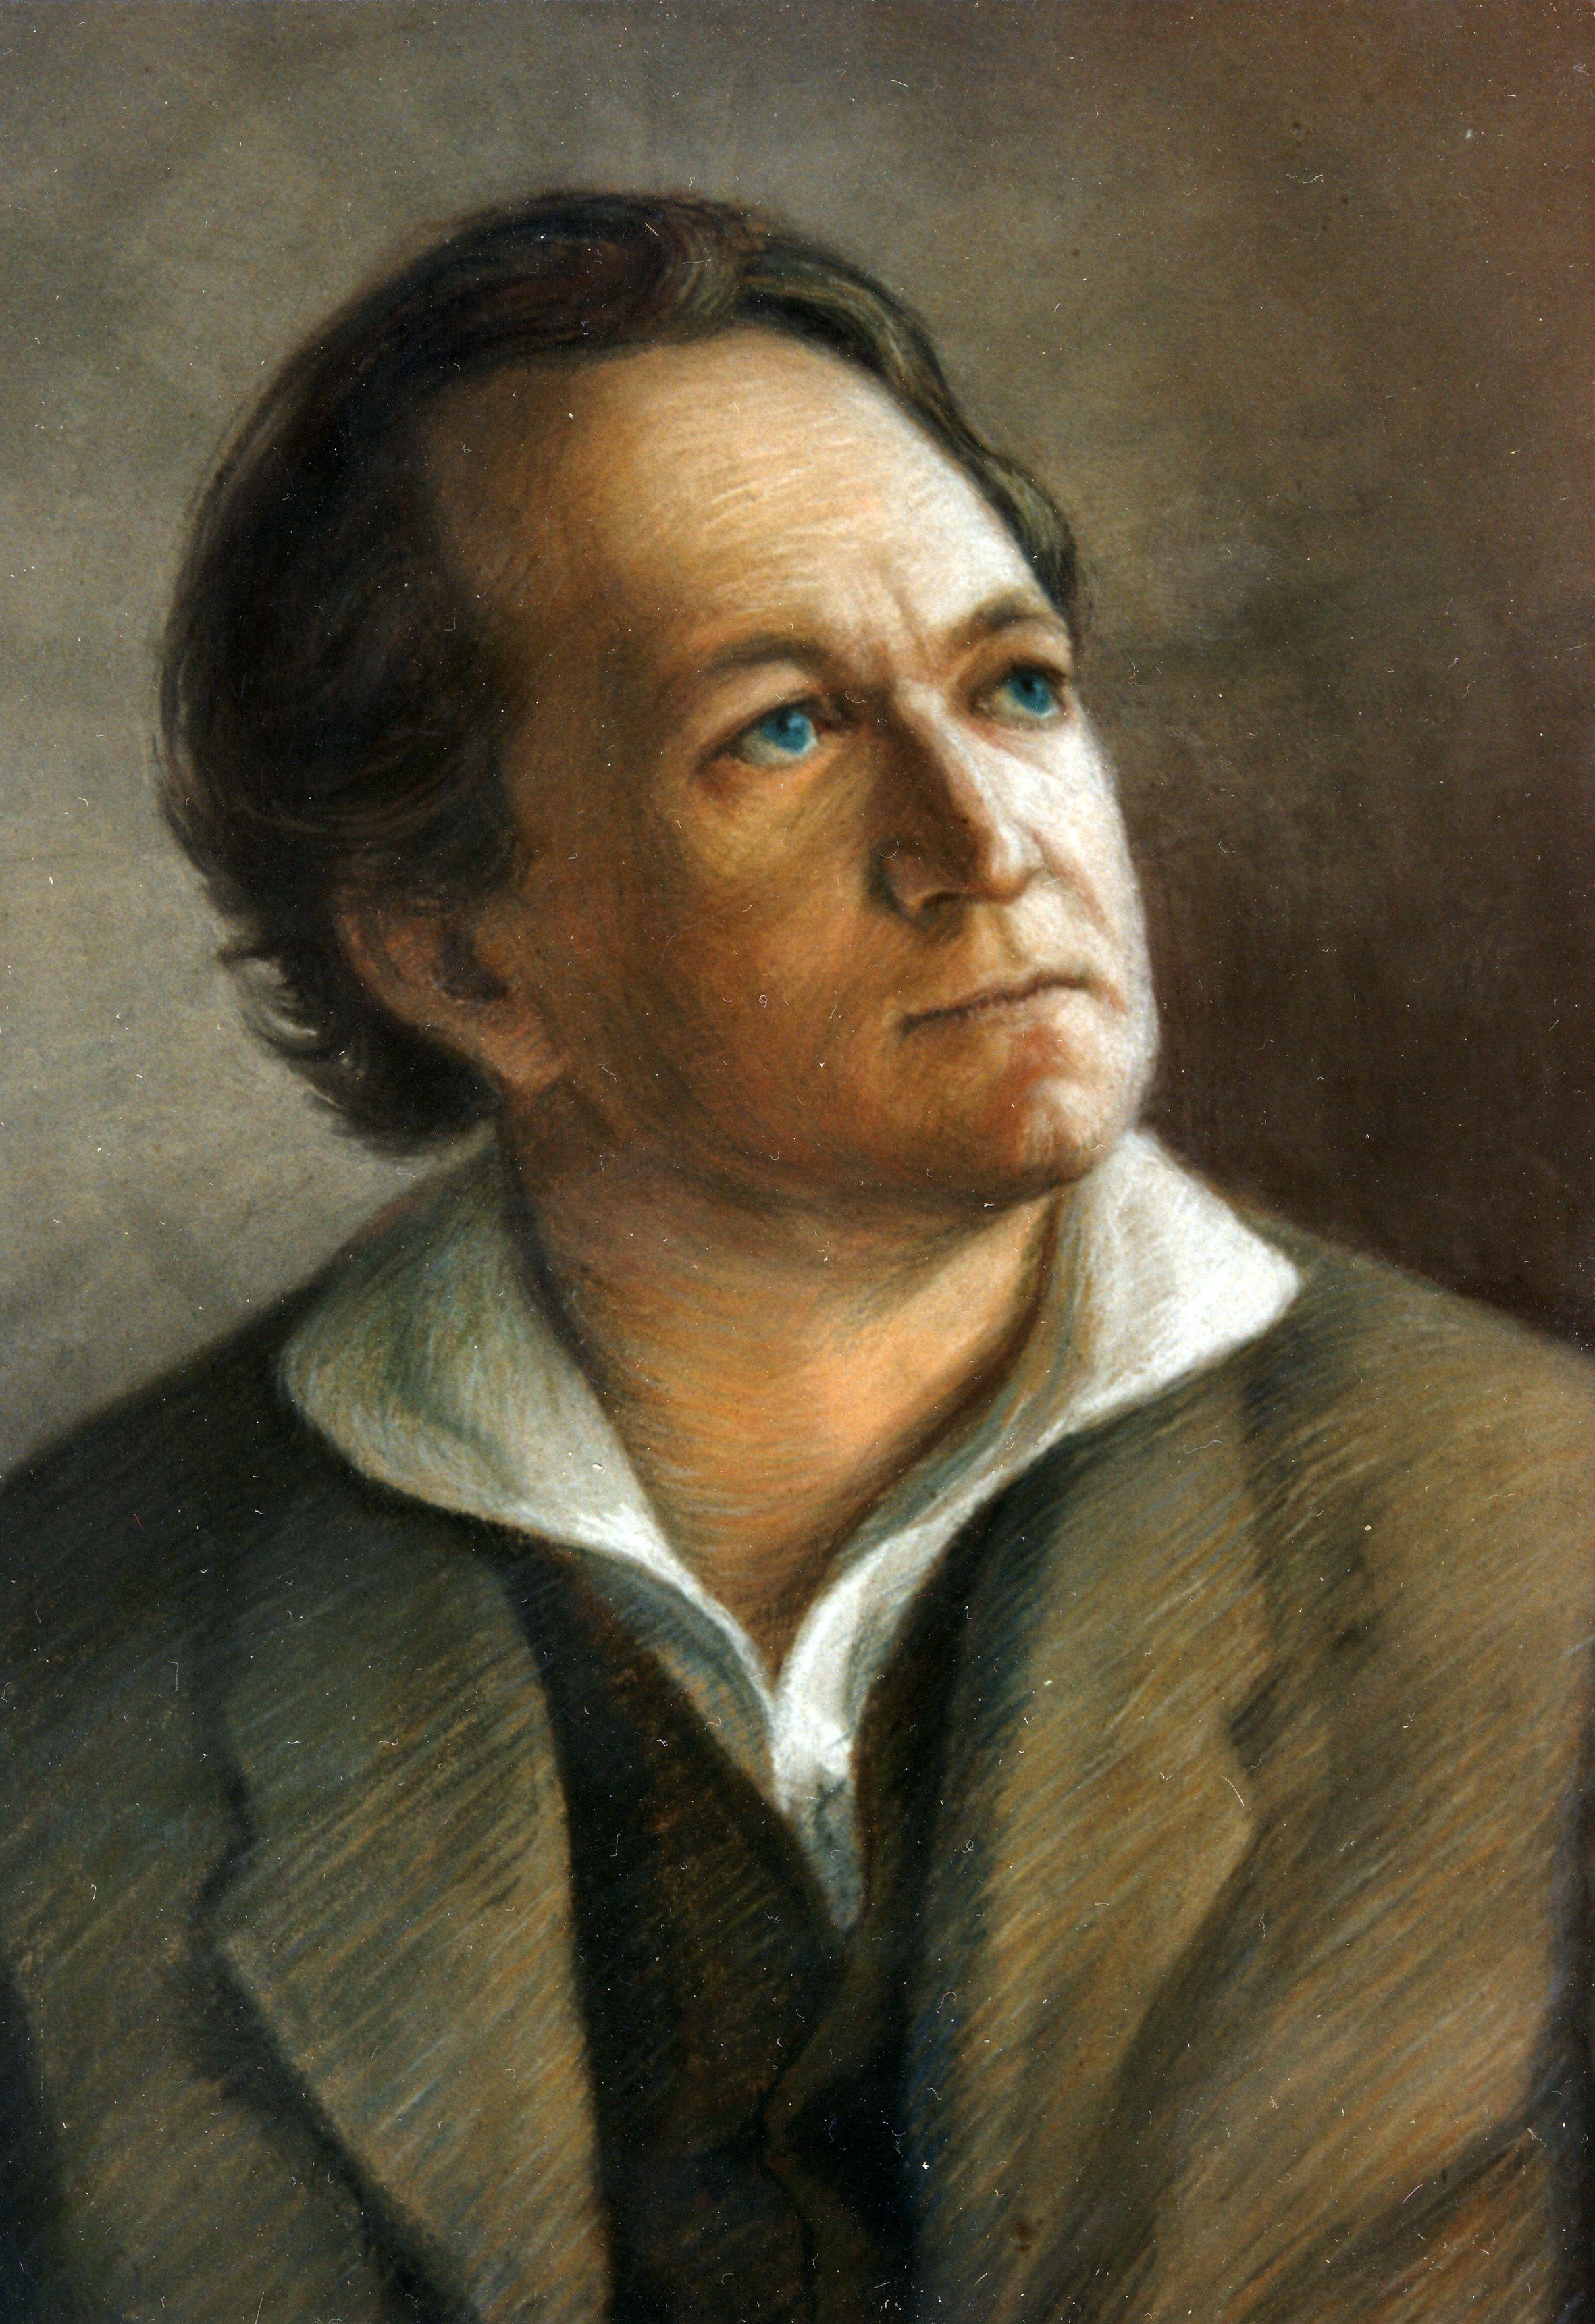 Pekka Ervast